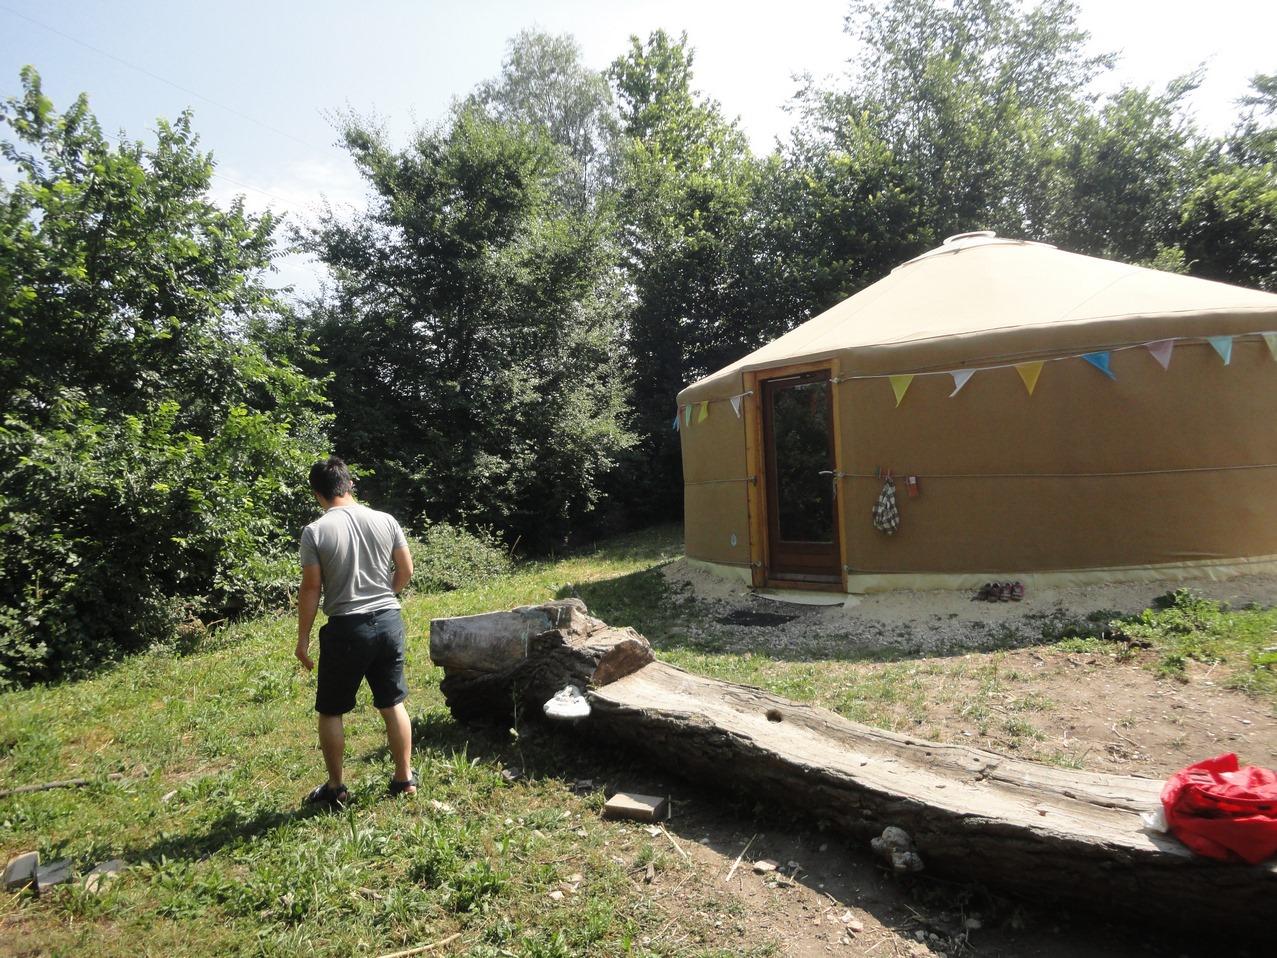 foto 1 yurta (Copia).JPG